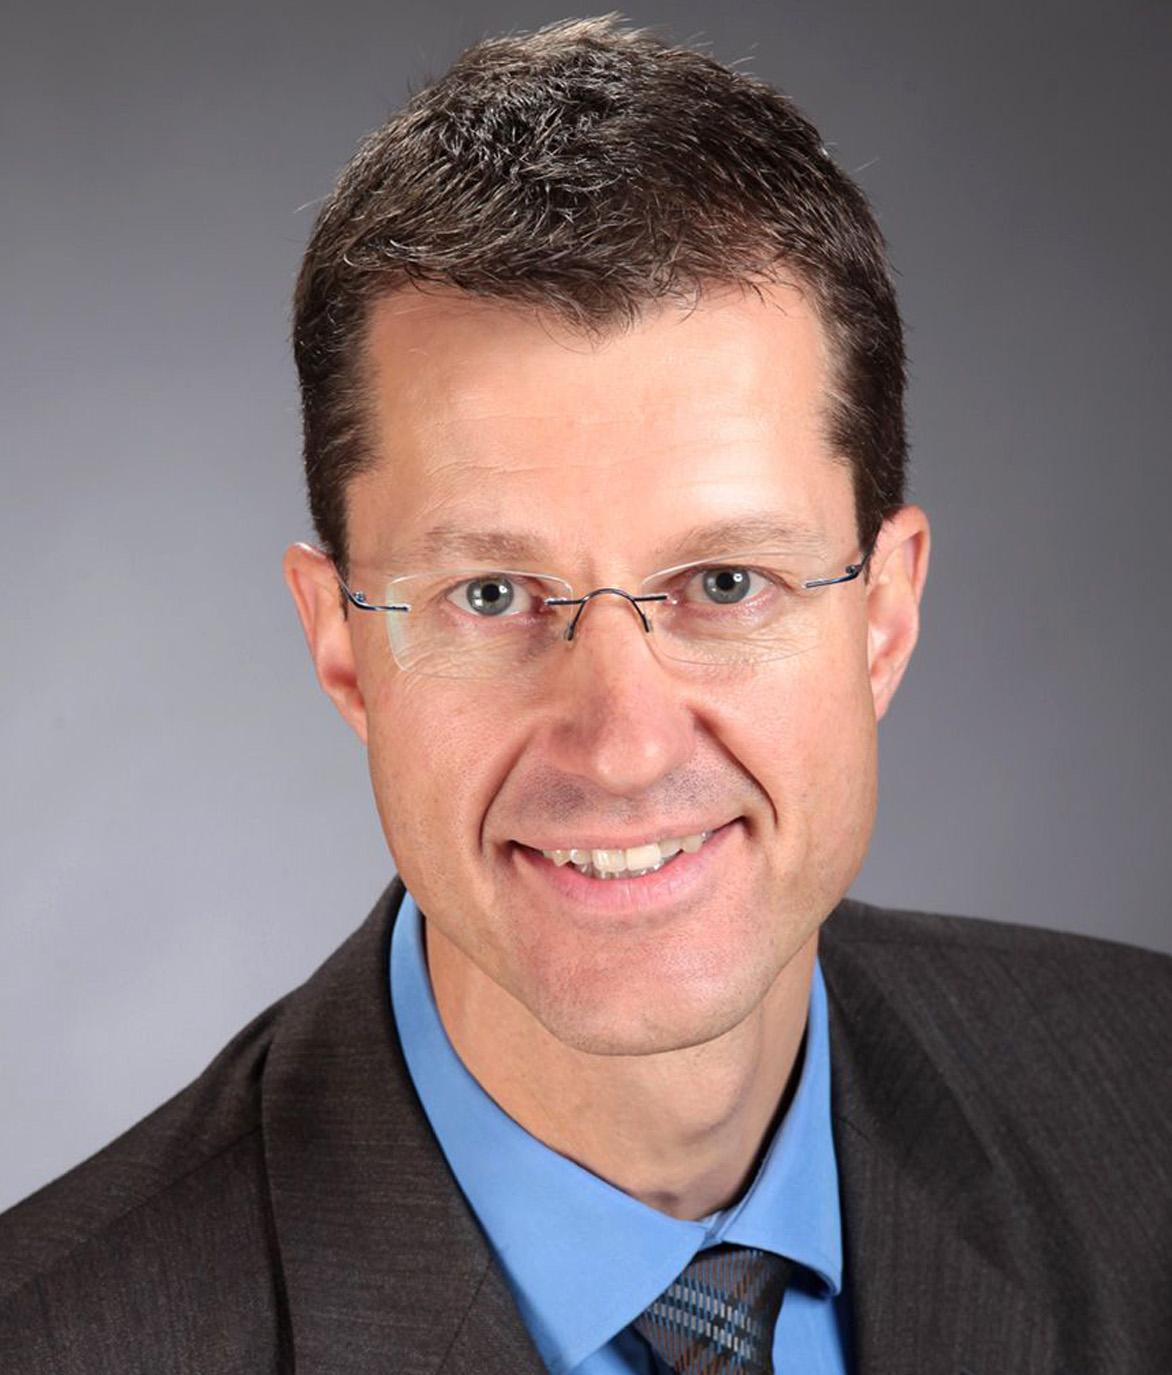 Thomas Schulz, Head of KAM and ISM Biotech and Pharma, FESTO